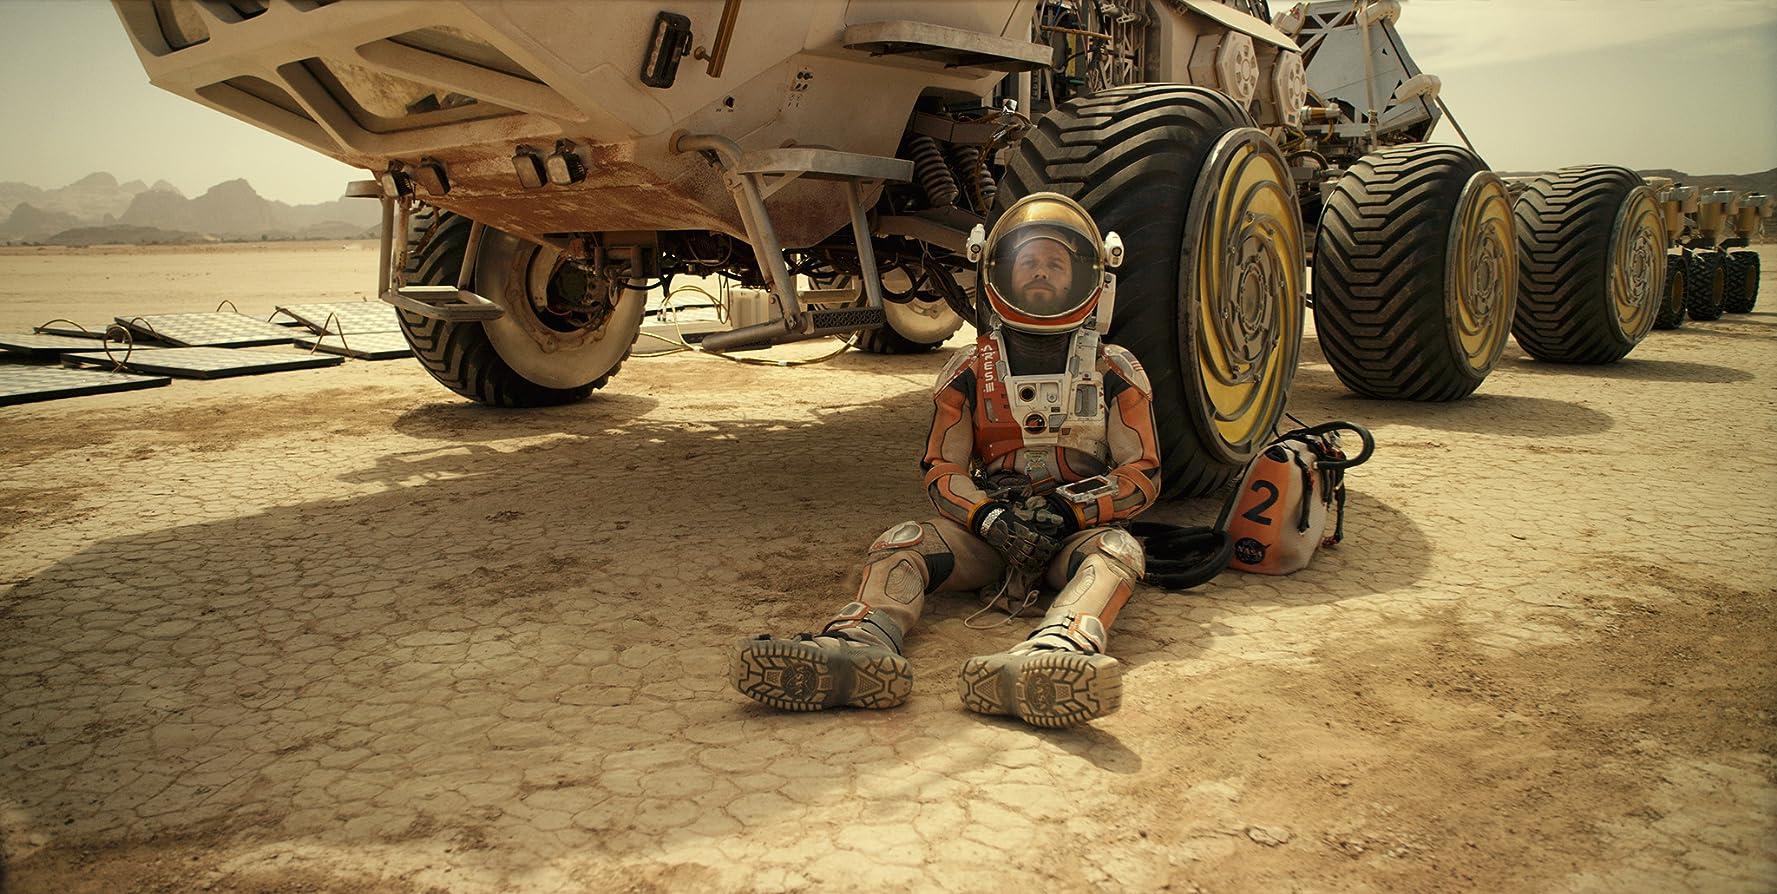 Cuplikan Film The Martian